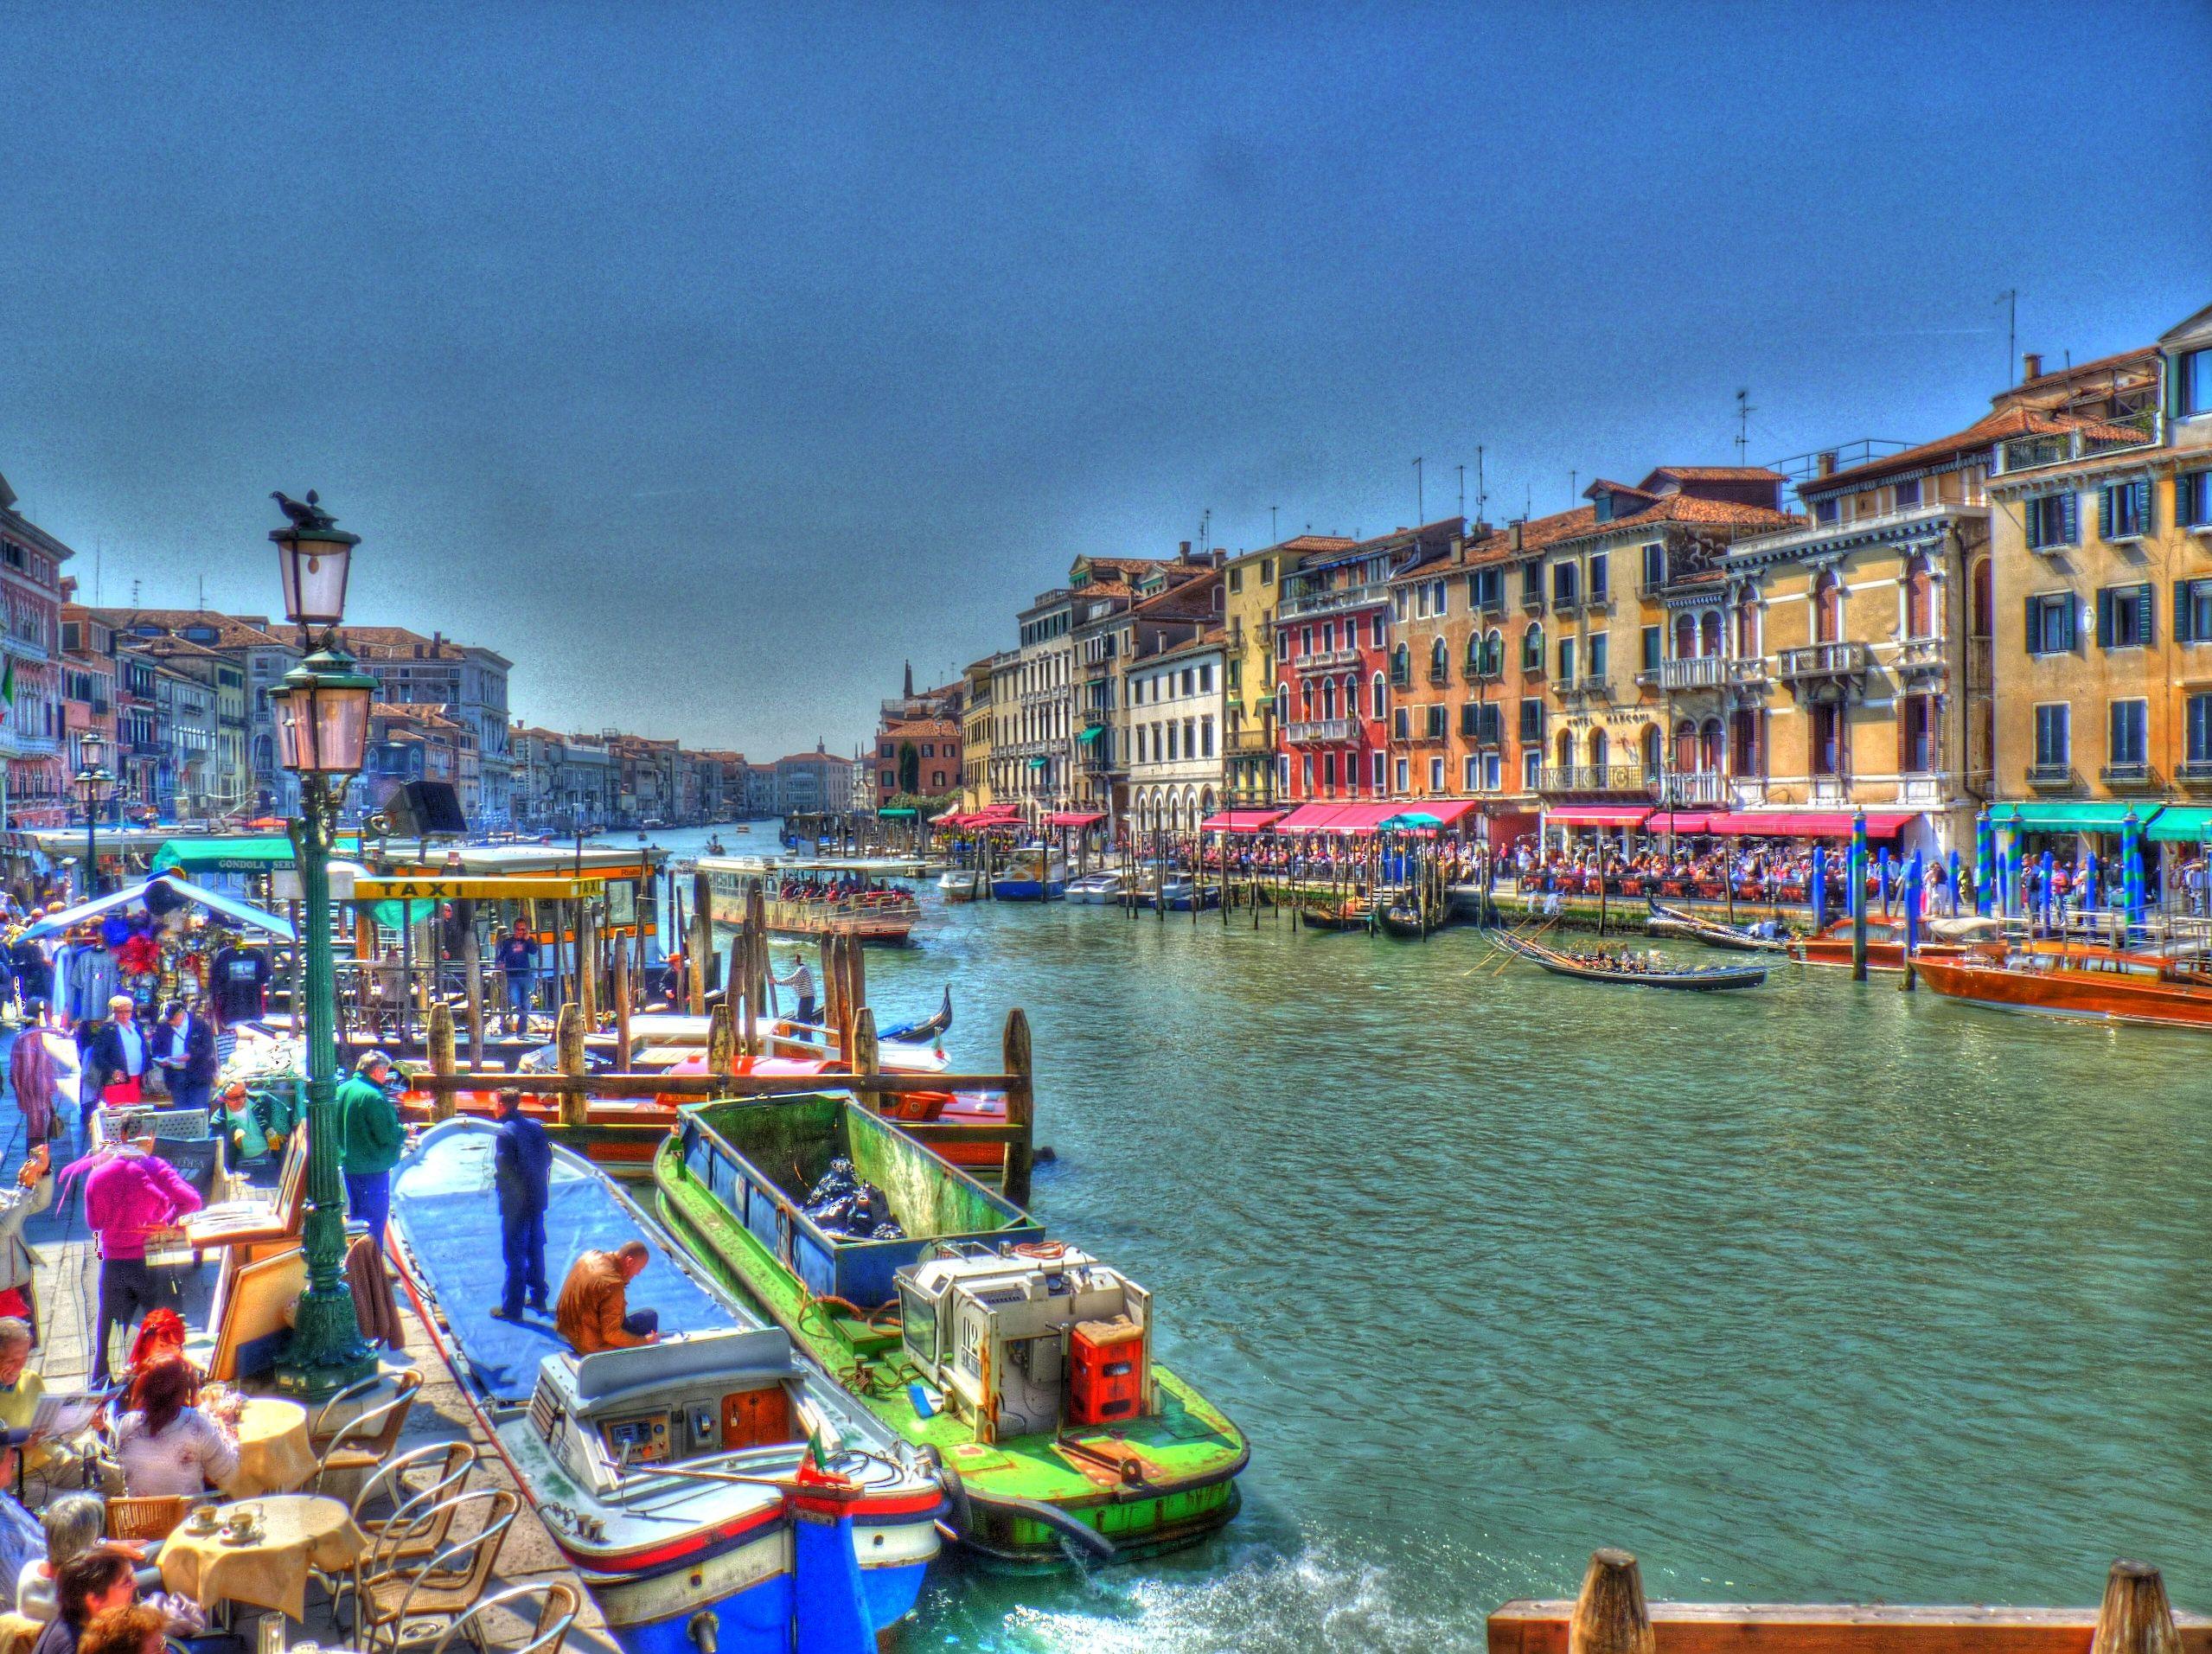 Venice (Italy) by G Raybaud